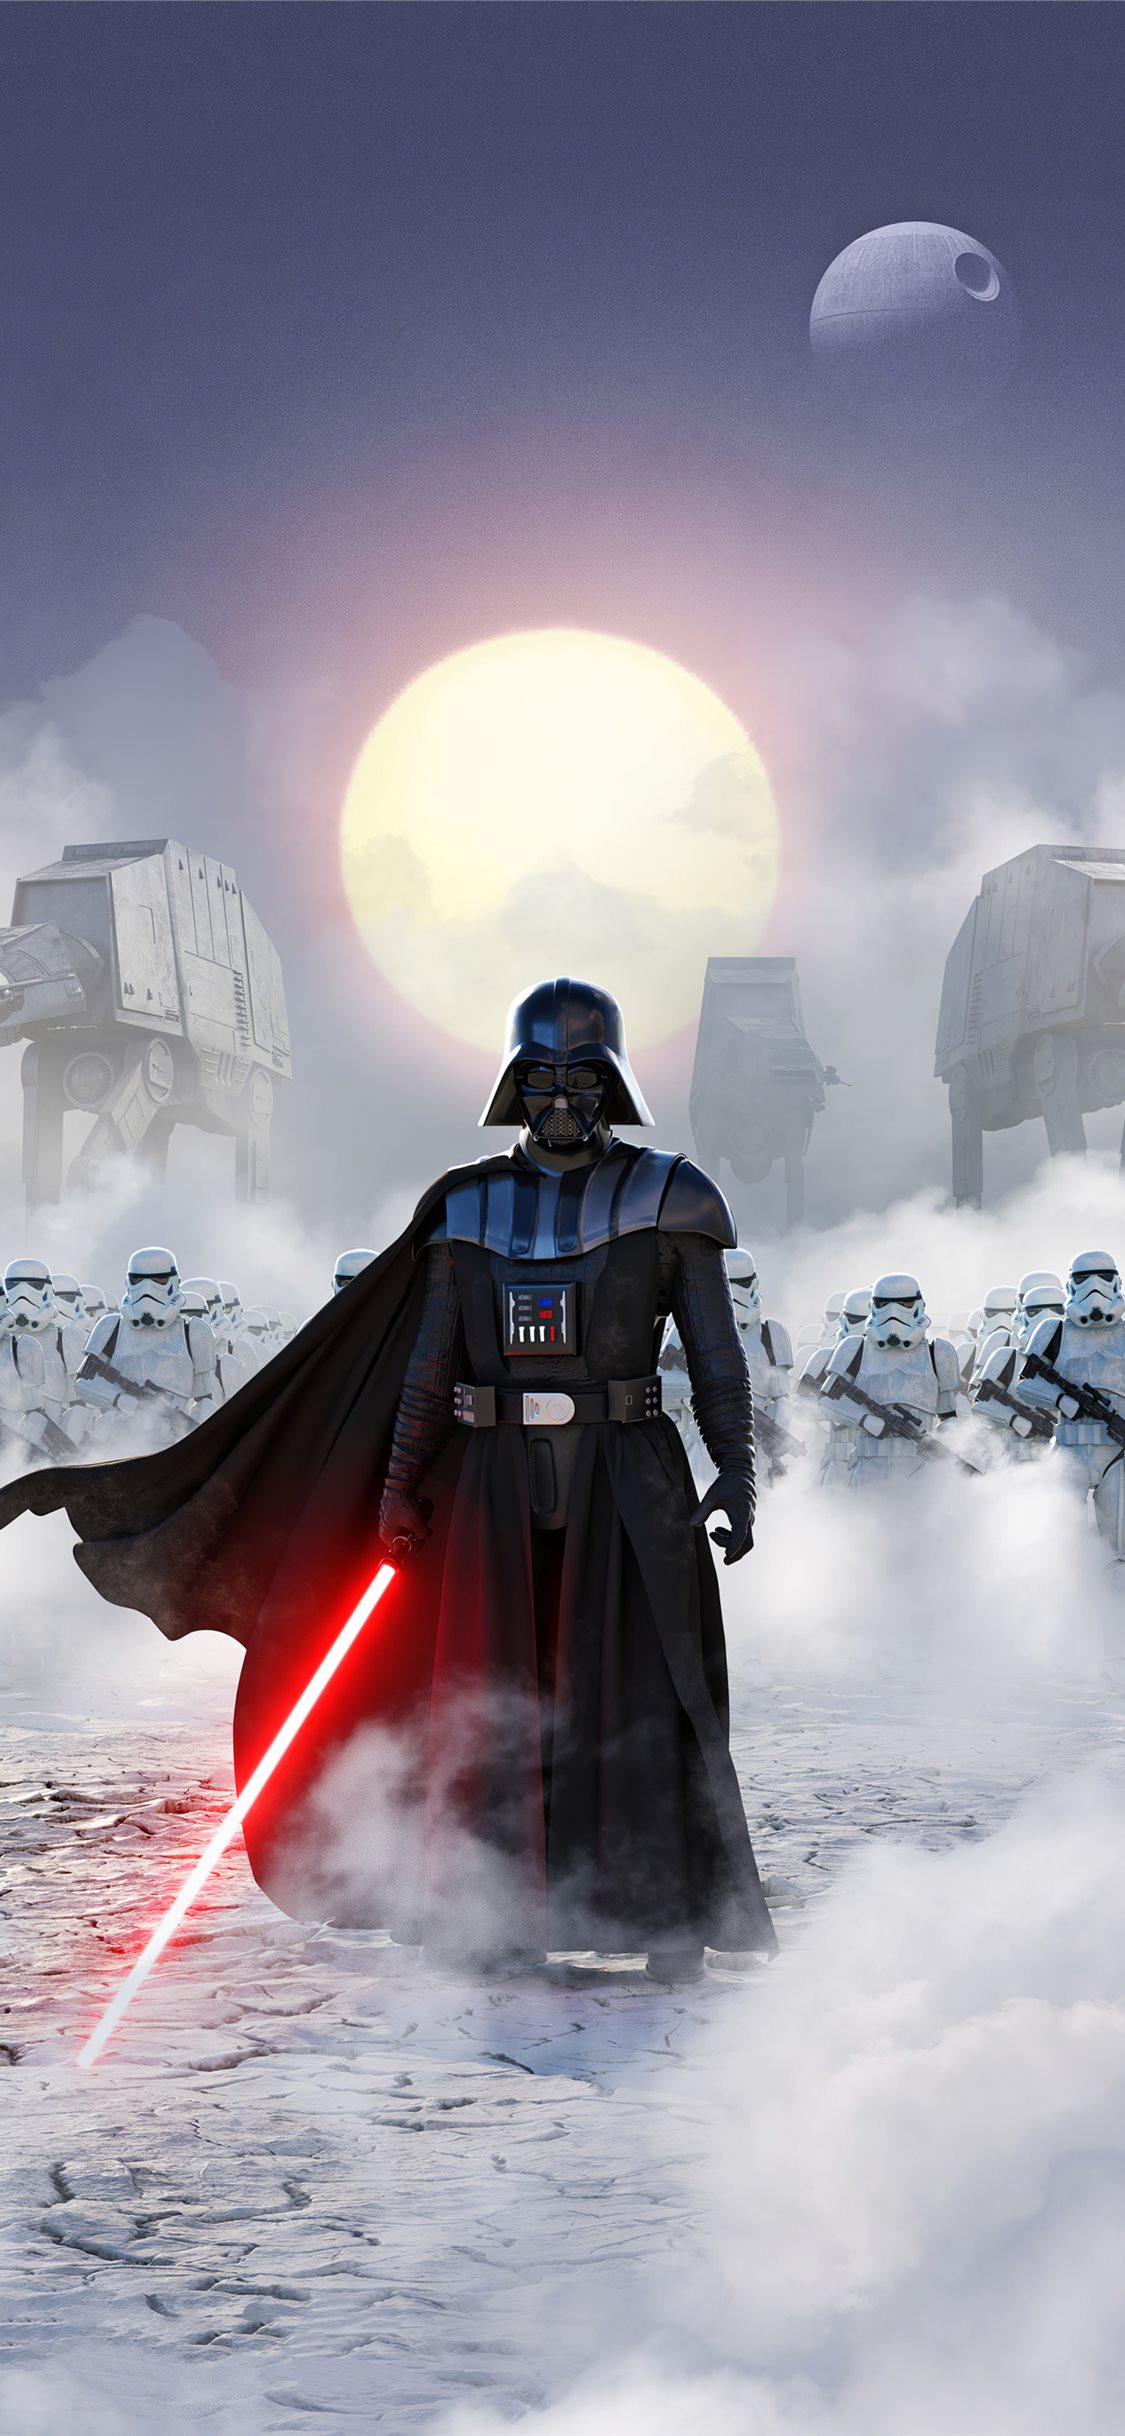 Best Star Wars Iphone X Hd Wallpapers Ilikewallpaper